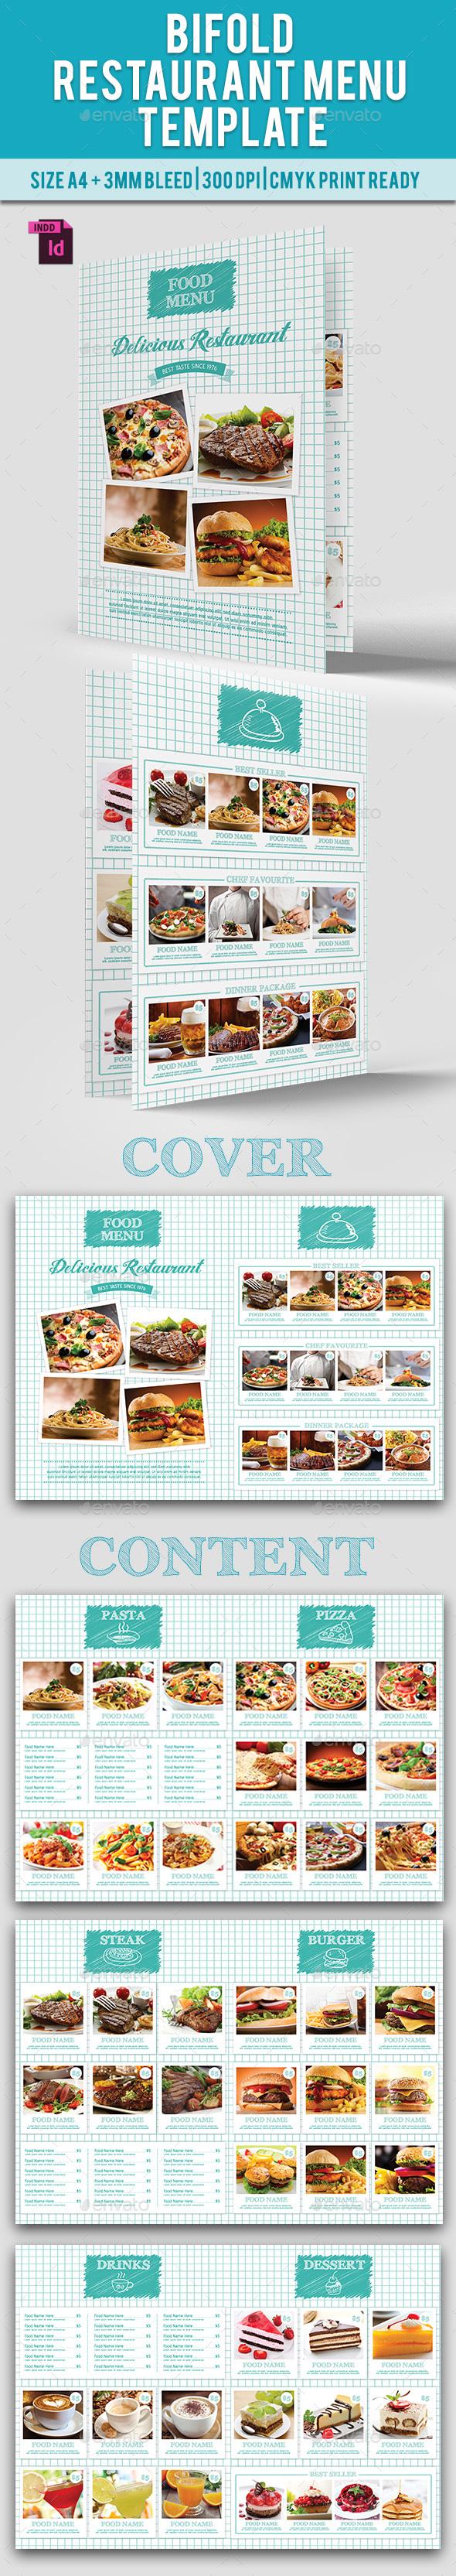 BiFold Restaurant Menu Vol. 10 - Food Menus Print Templates